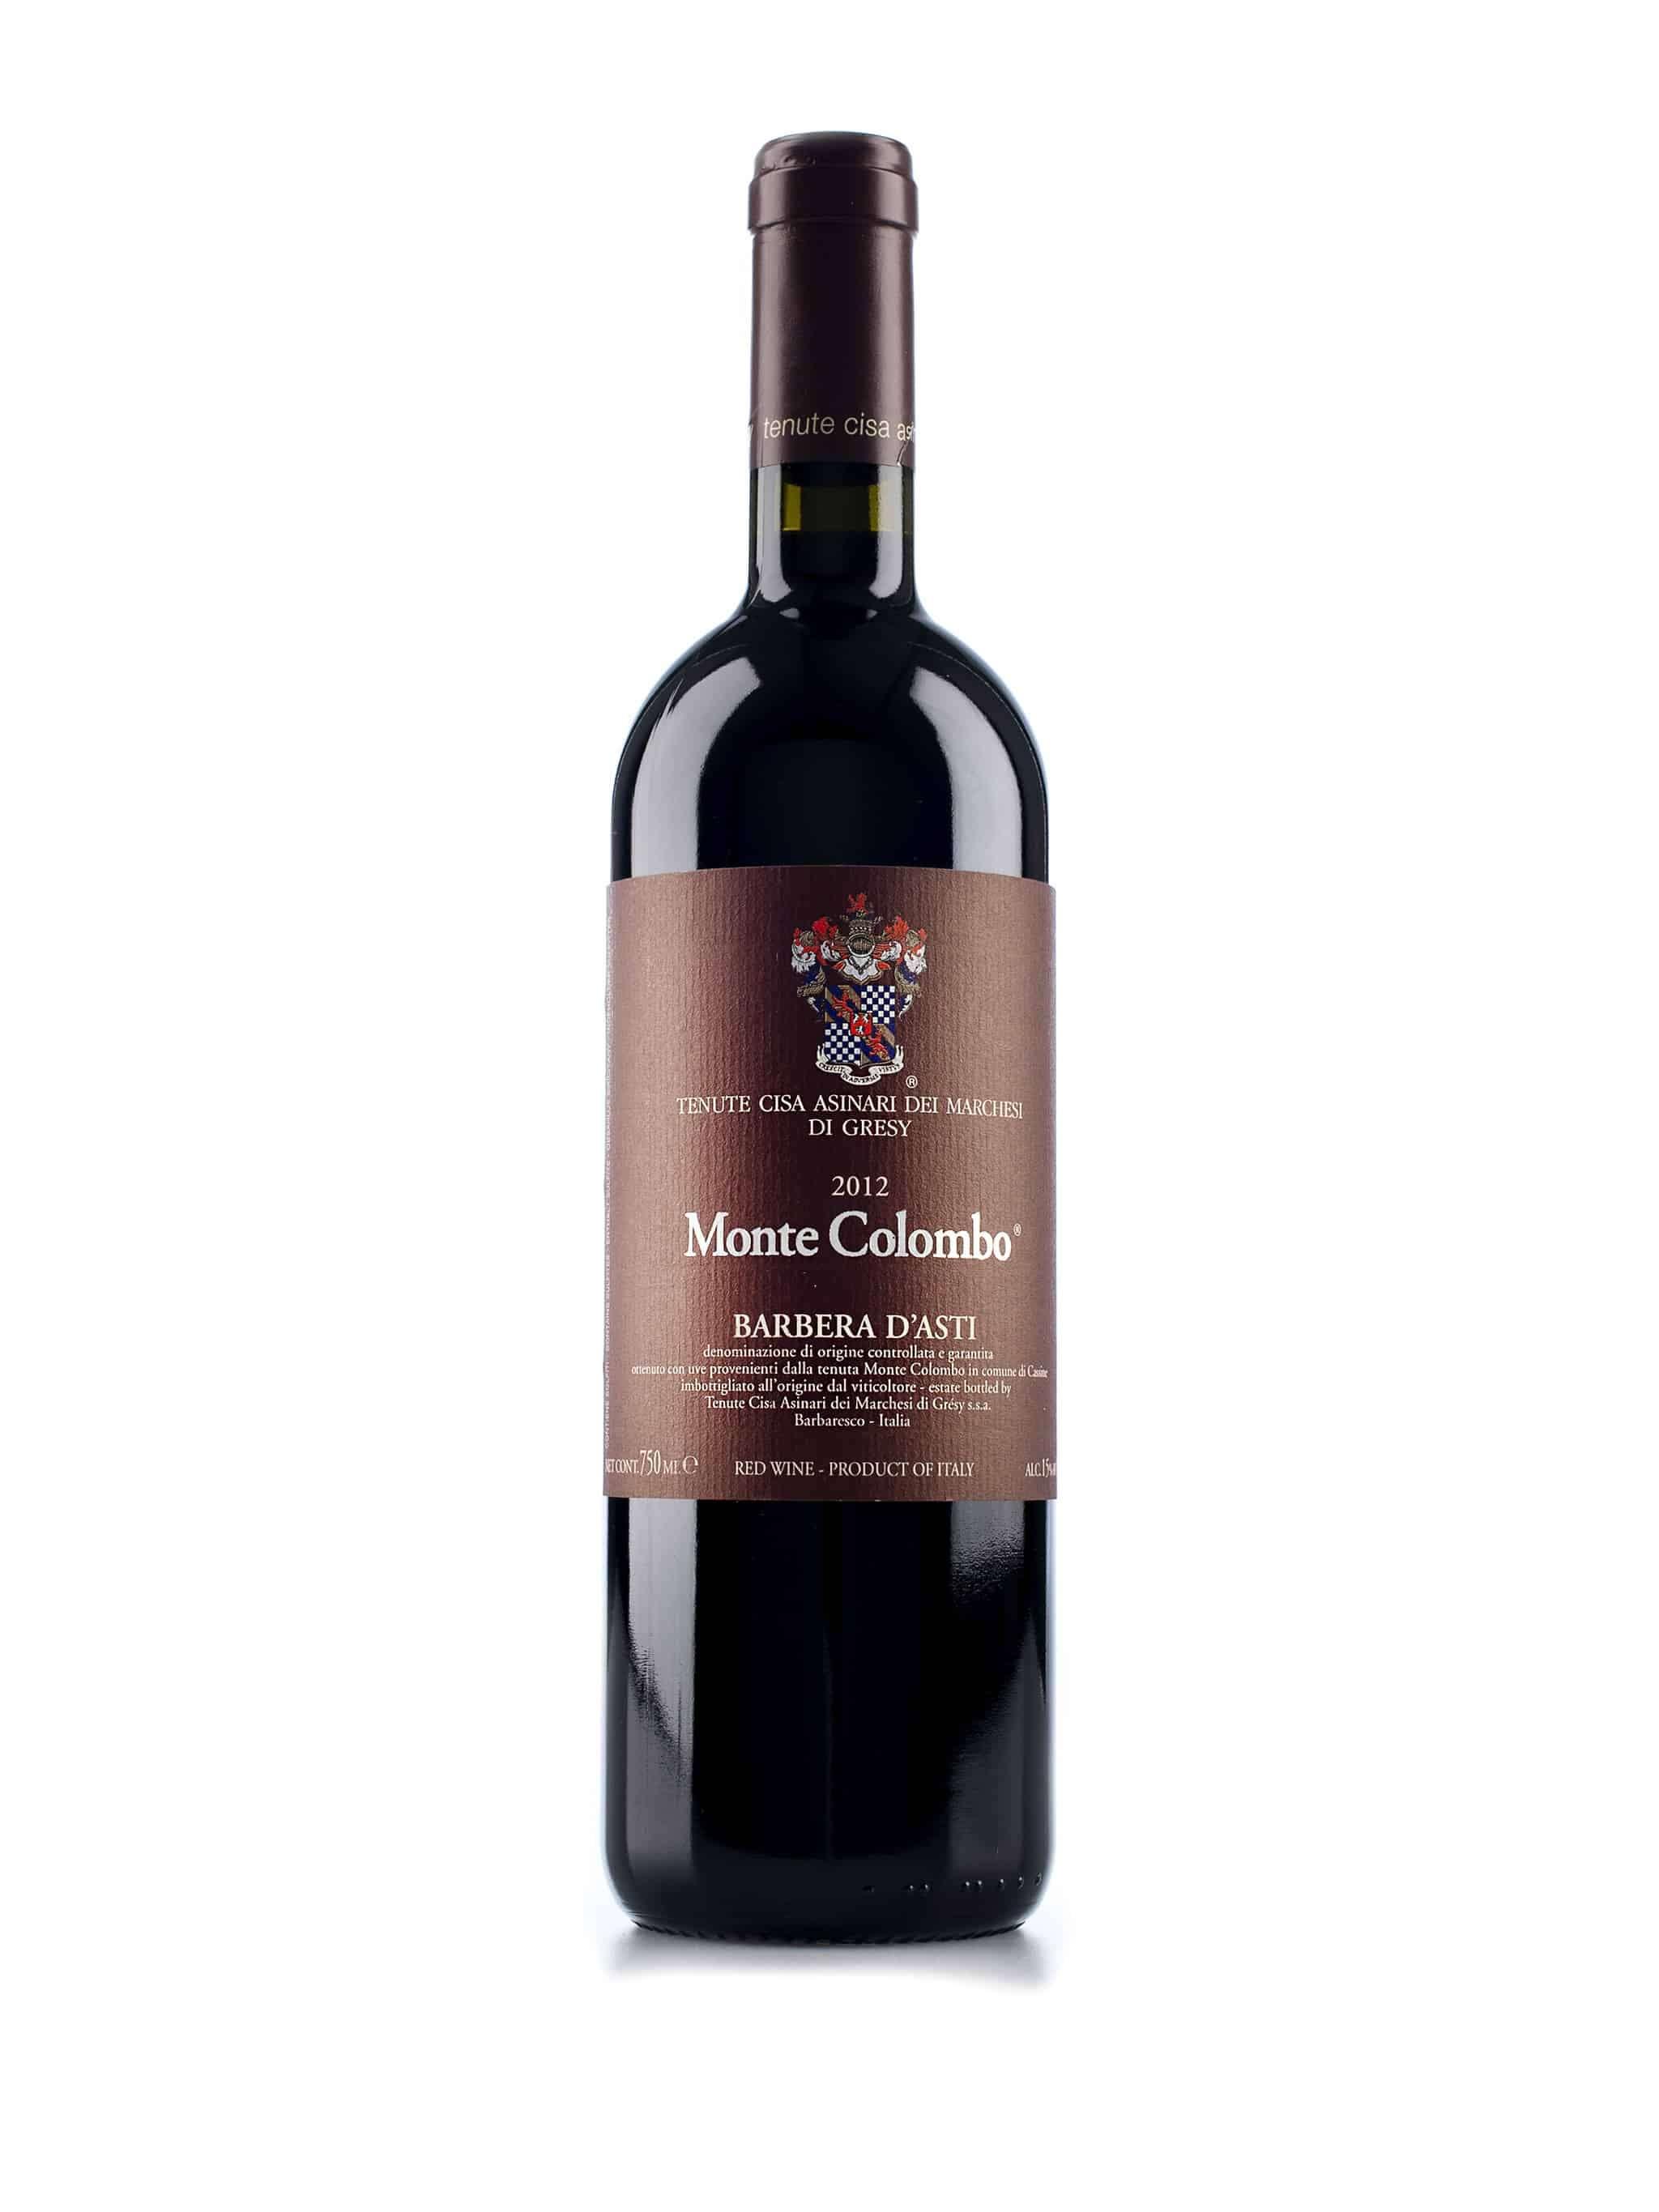 Italiaanse rode wijn van wijndomein Cisa Asinari dei Marchesi di Gresy: Barbera d'Asti Monte Colombo